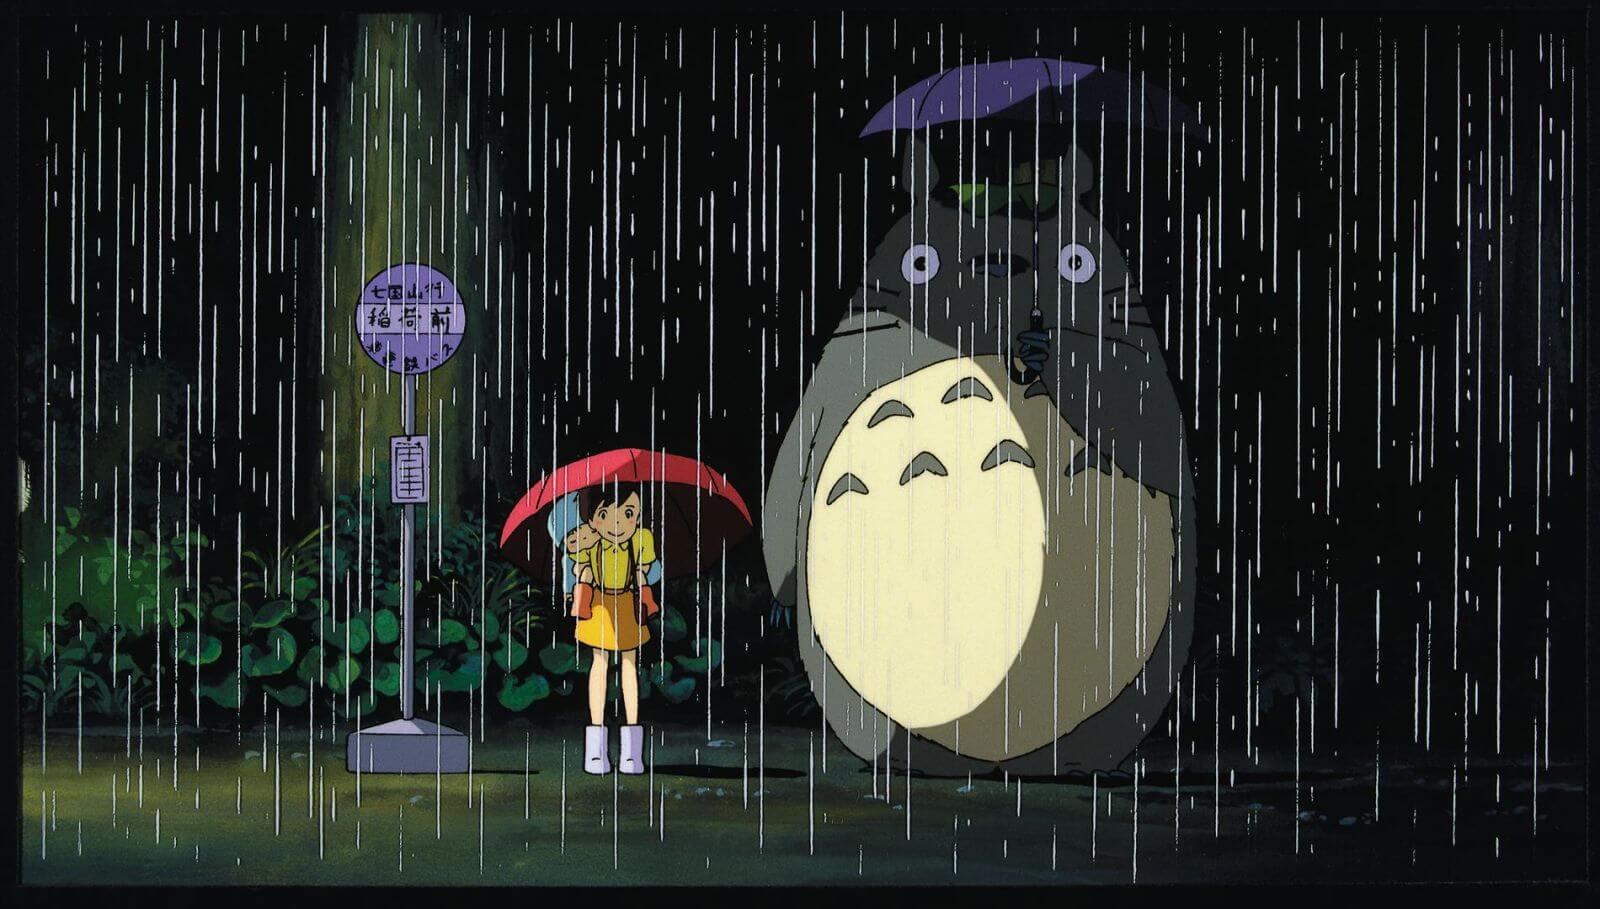 На картинке зонт (зонтик) «Тоторо» (Totoro) 6 вариантов, кадр из аниме.